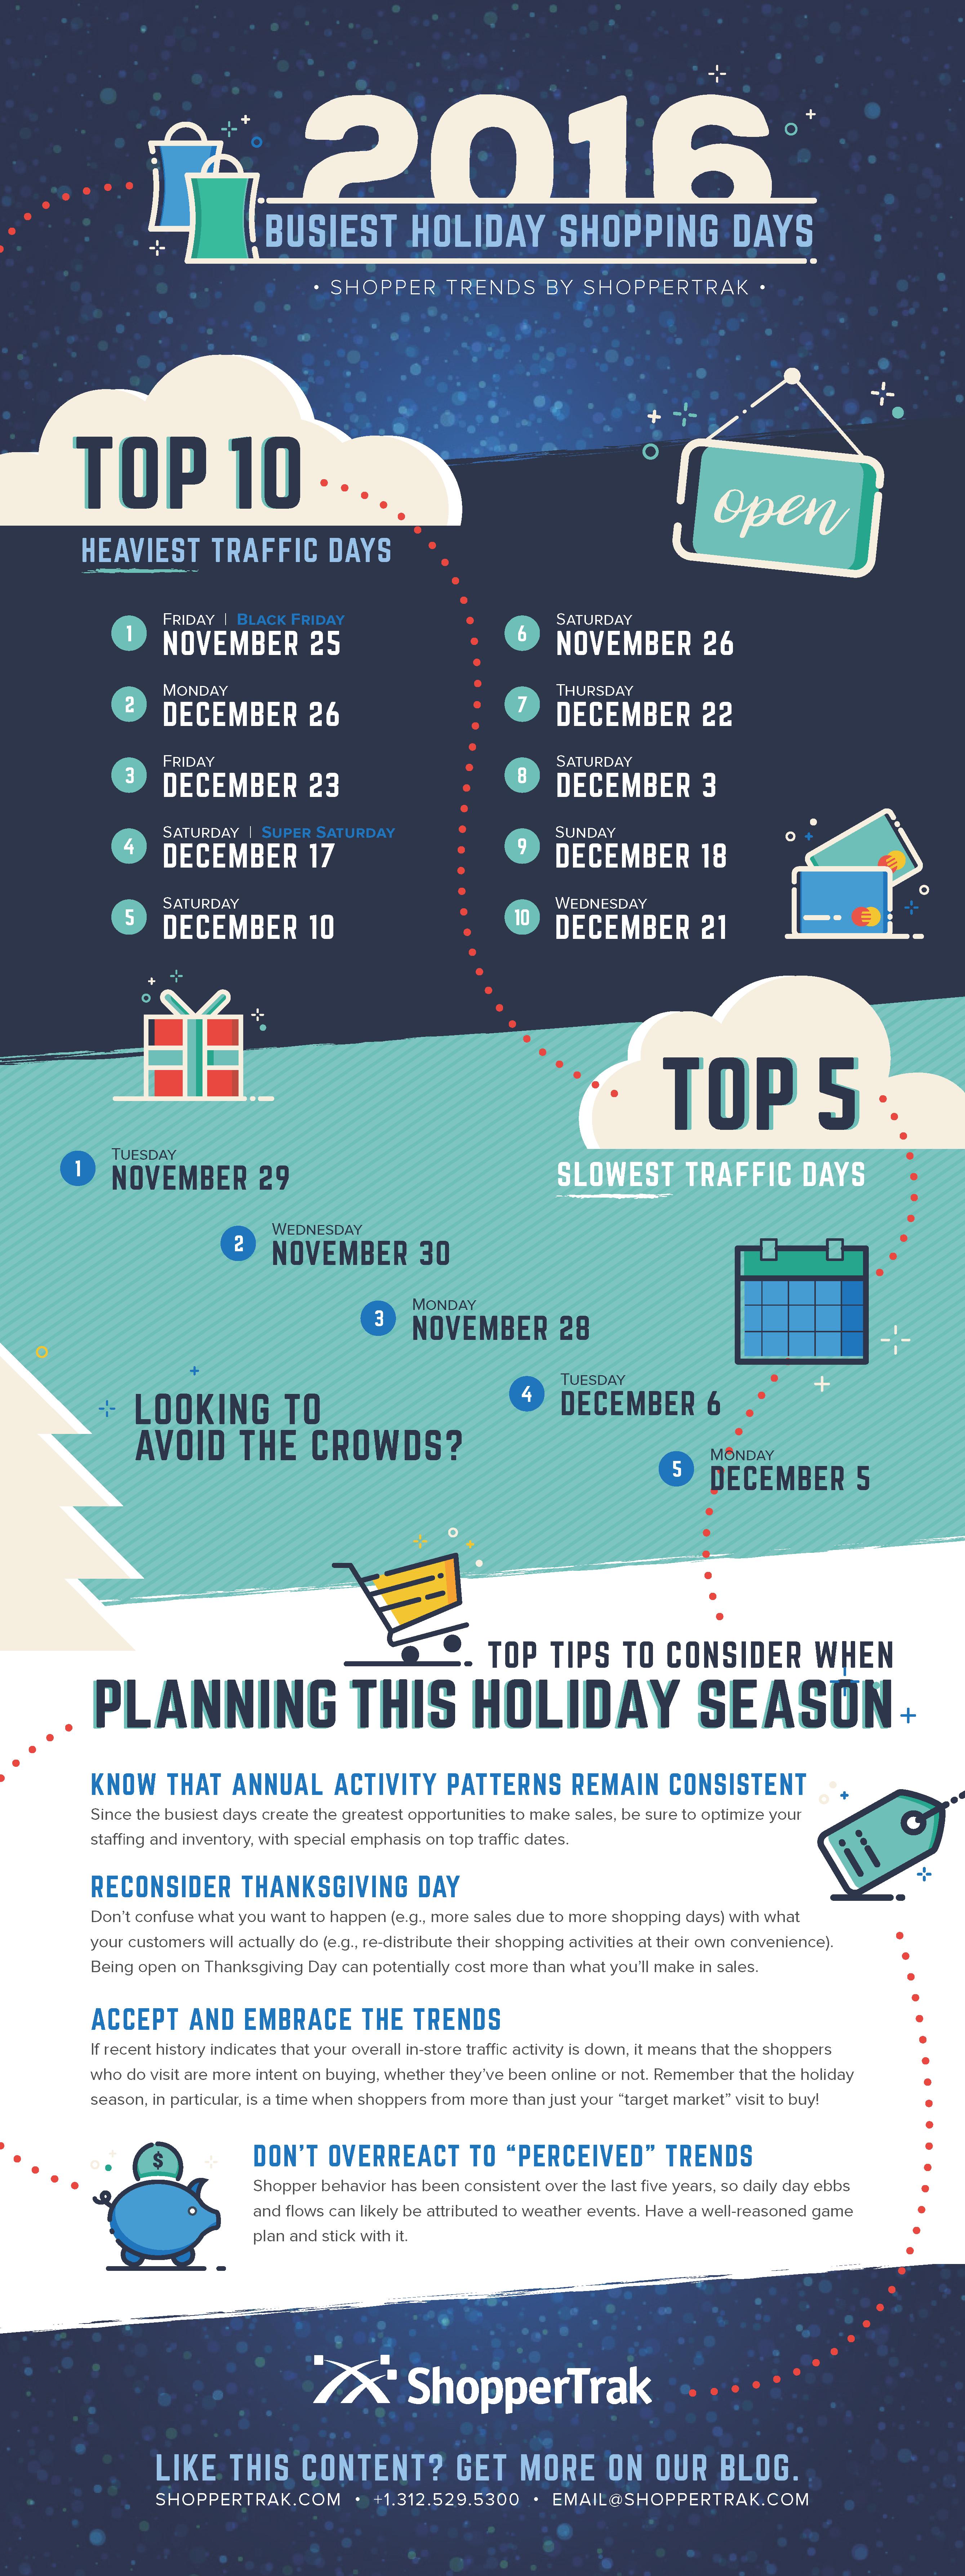 final-shoppertrak-2016-holidayshoppingcalendar